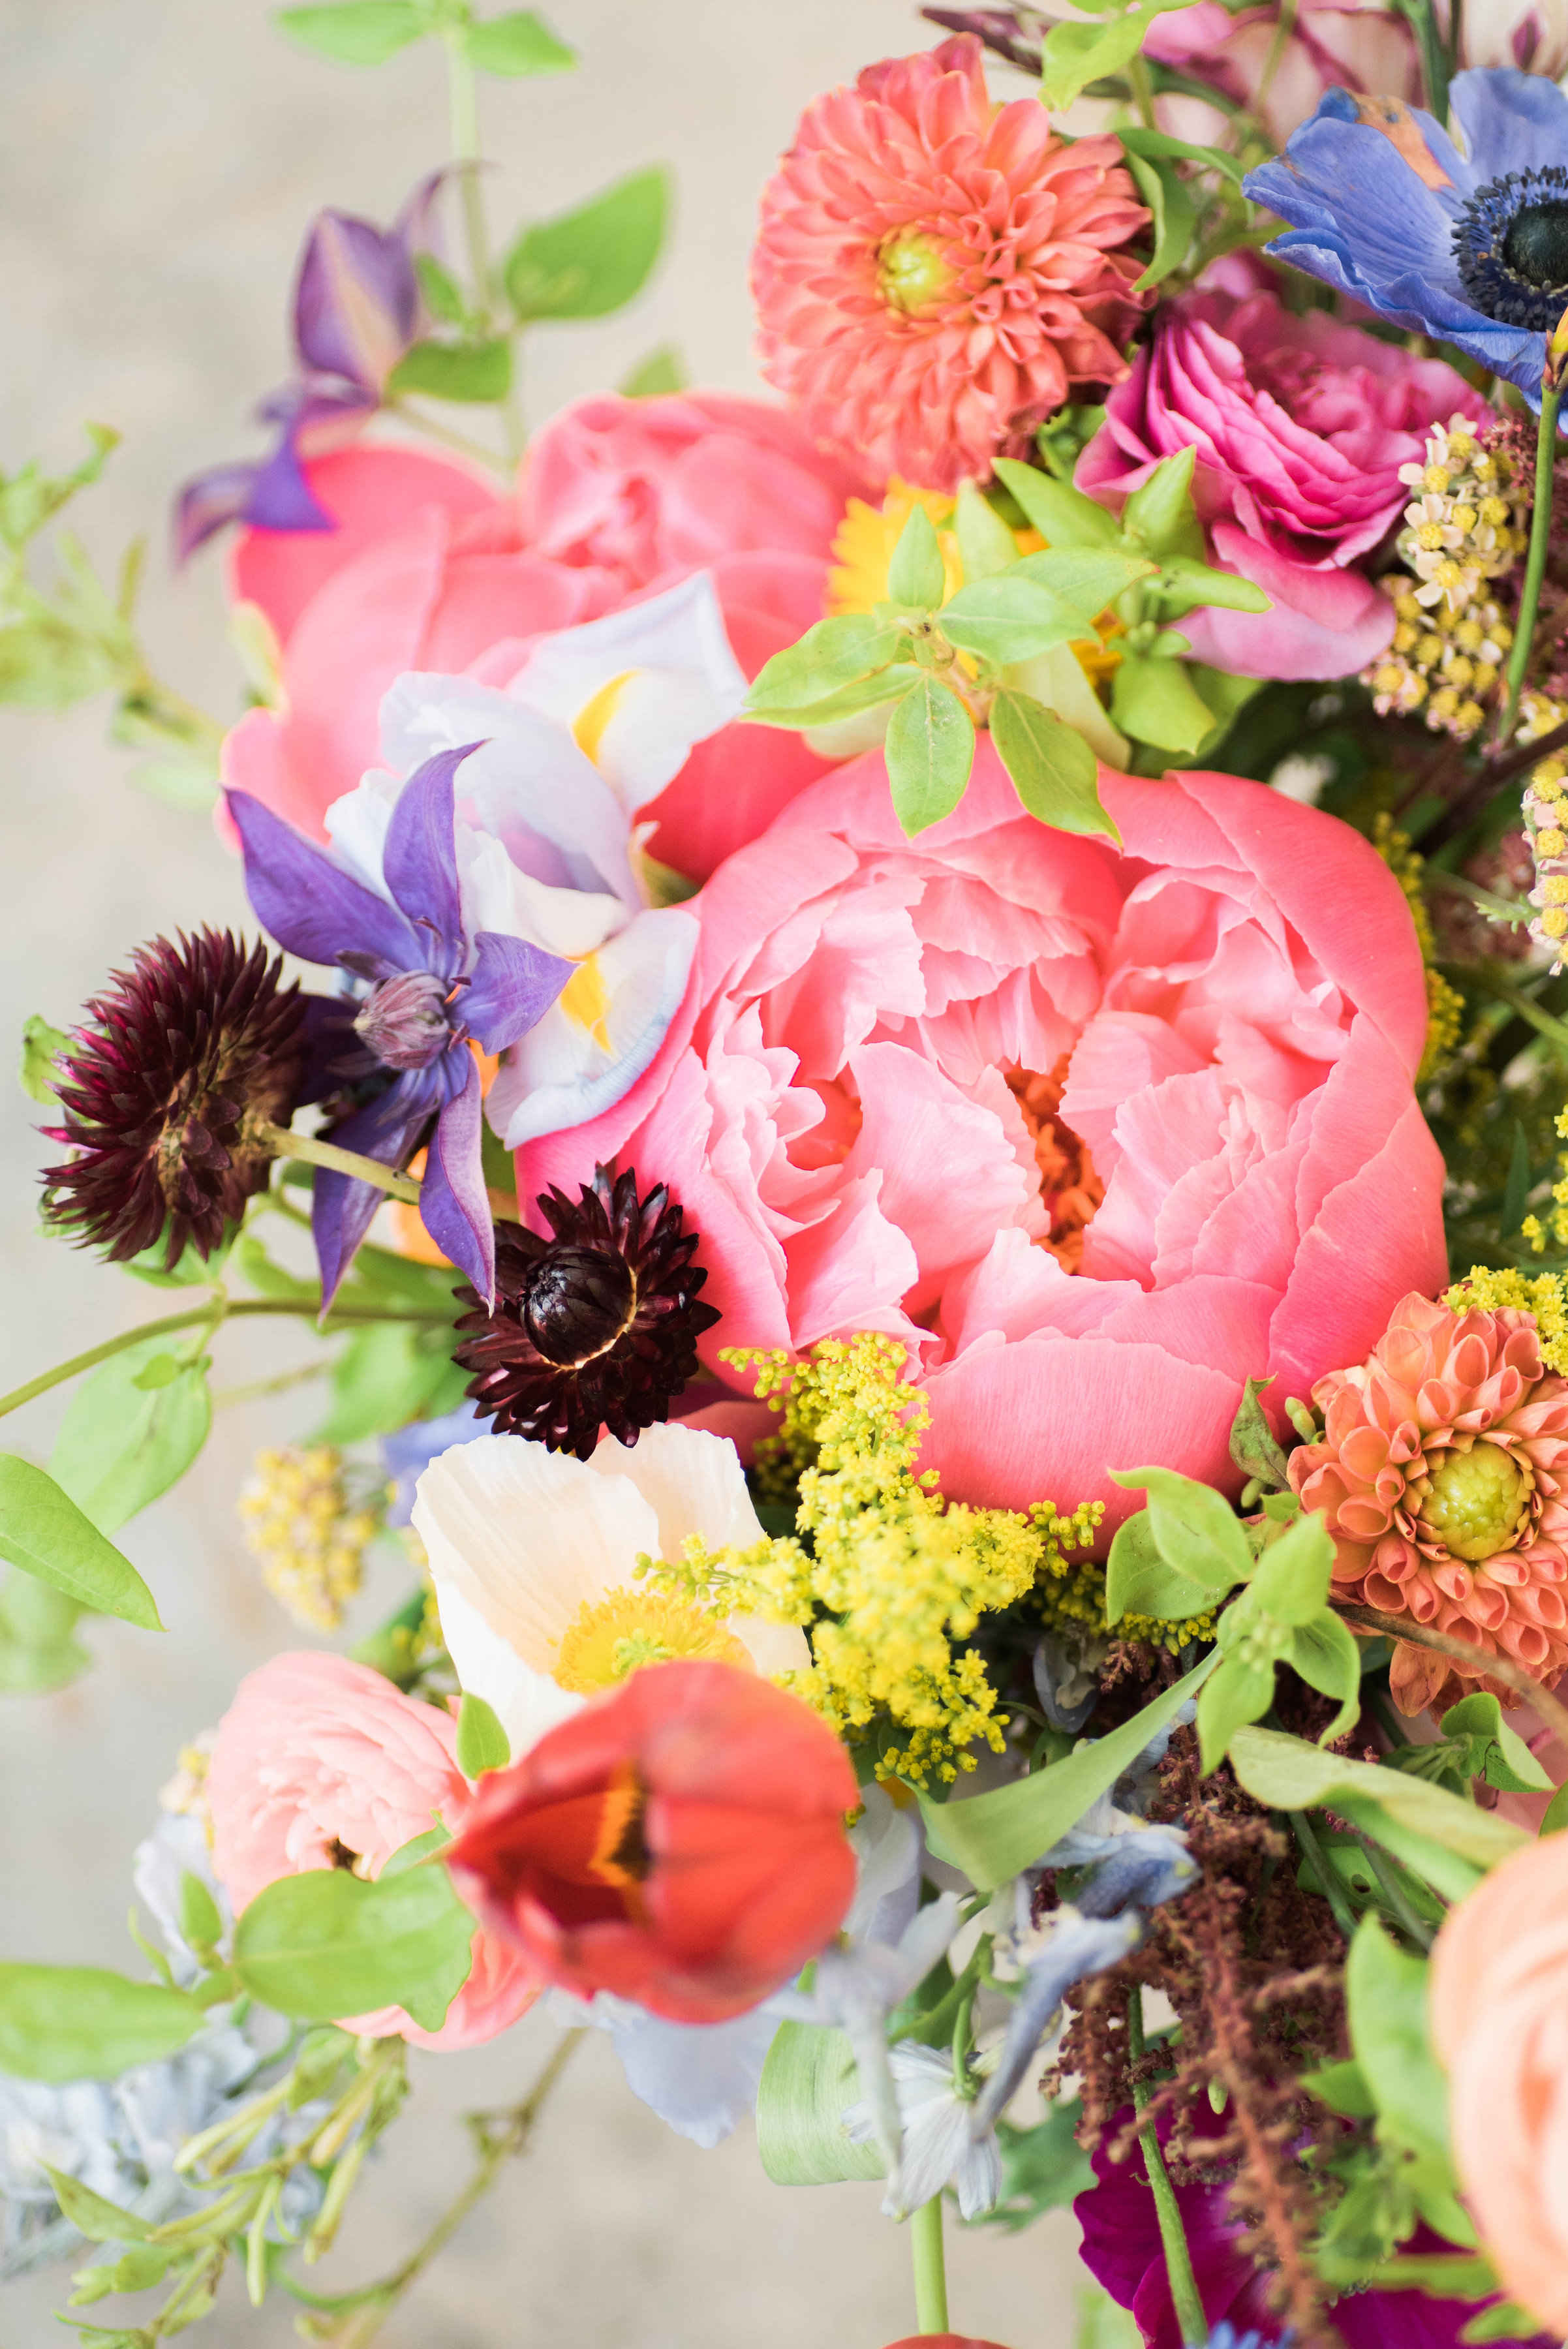 Natural, wildflower style bridal bouquet with peonies, strawflower, anemones, dahlias, ranunculus // Chagall inspired wedding flower in Nashville